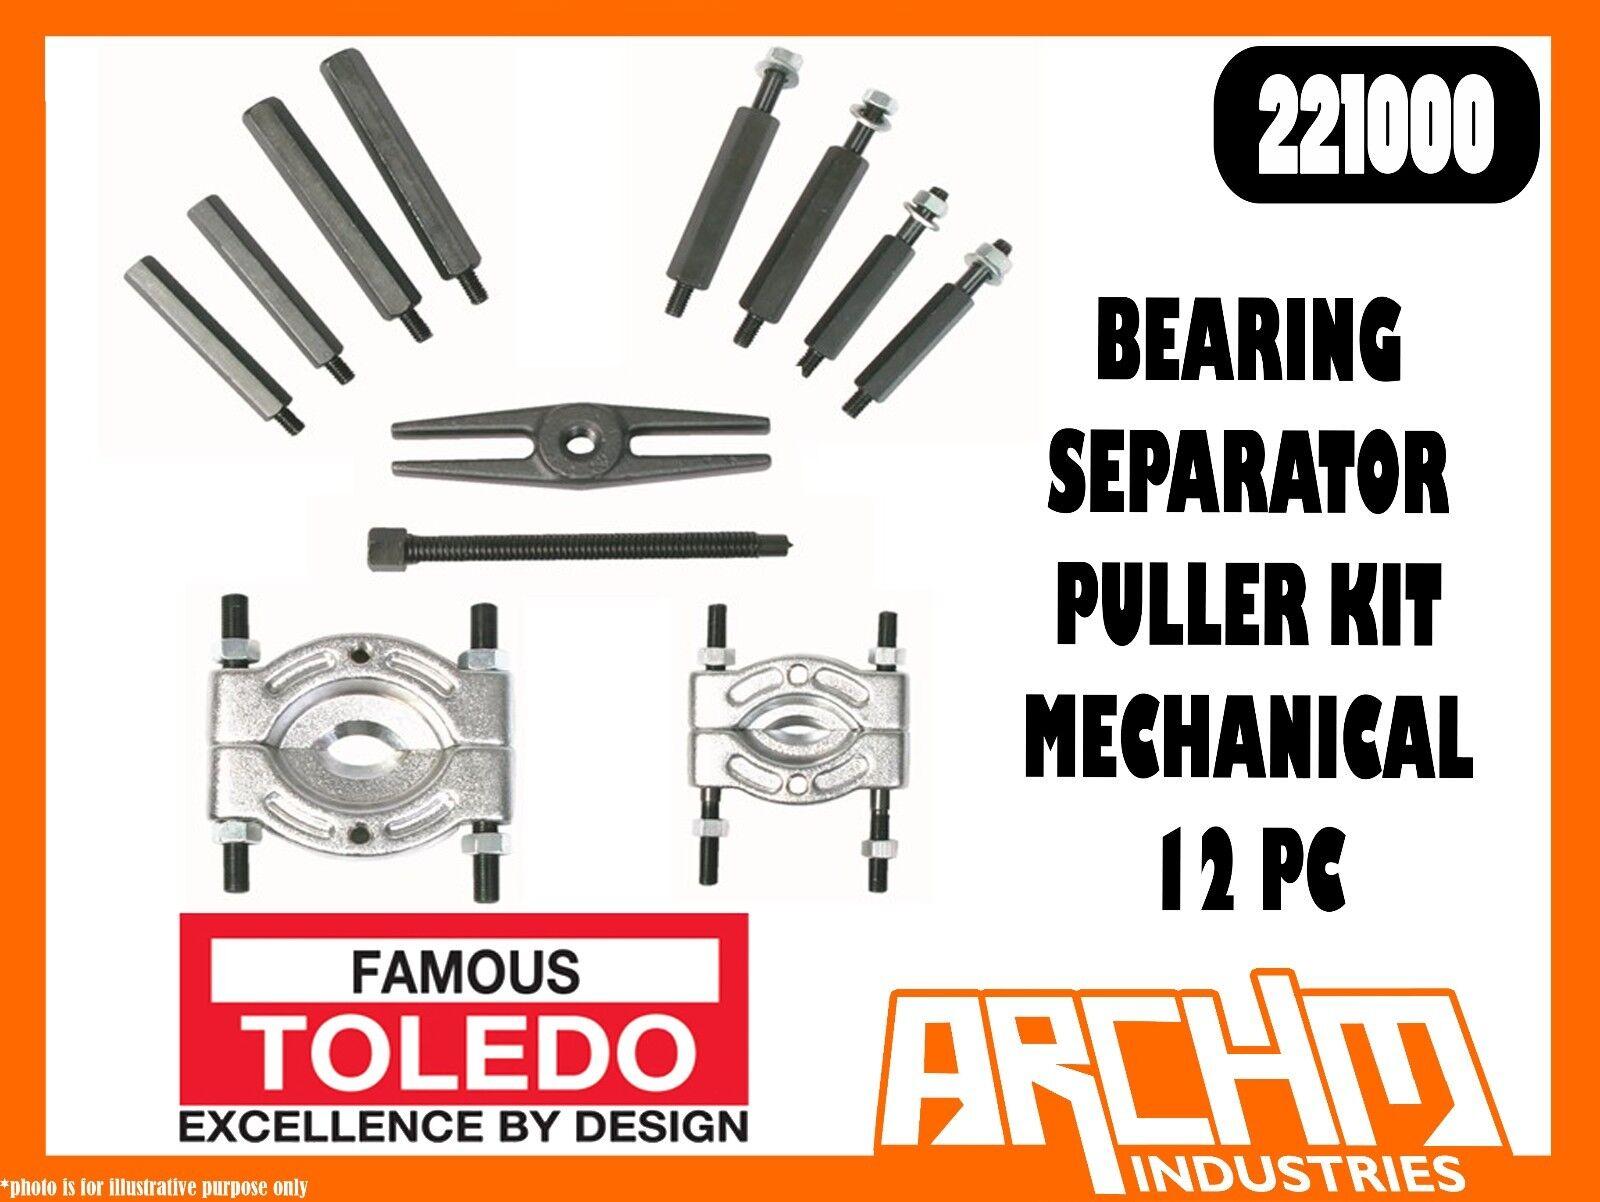 TOLEDO 221000 - BEARING SEPARATOR PULLER KIT MECHANICAL 12 PC - SMALL MEDIUM